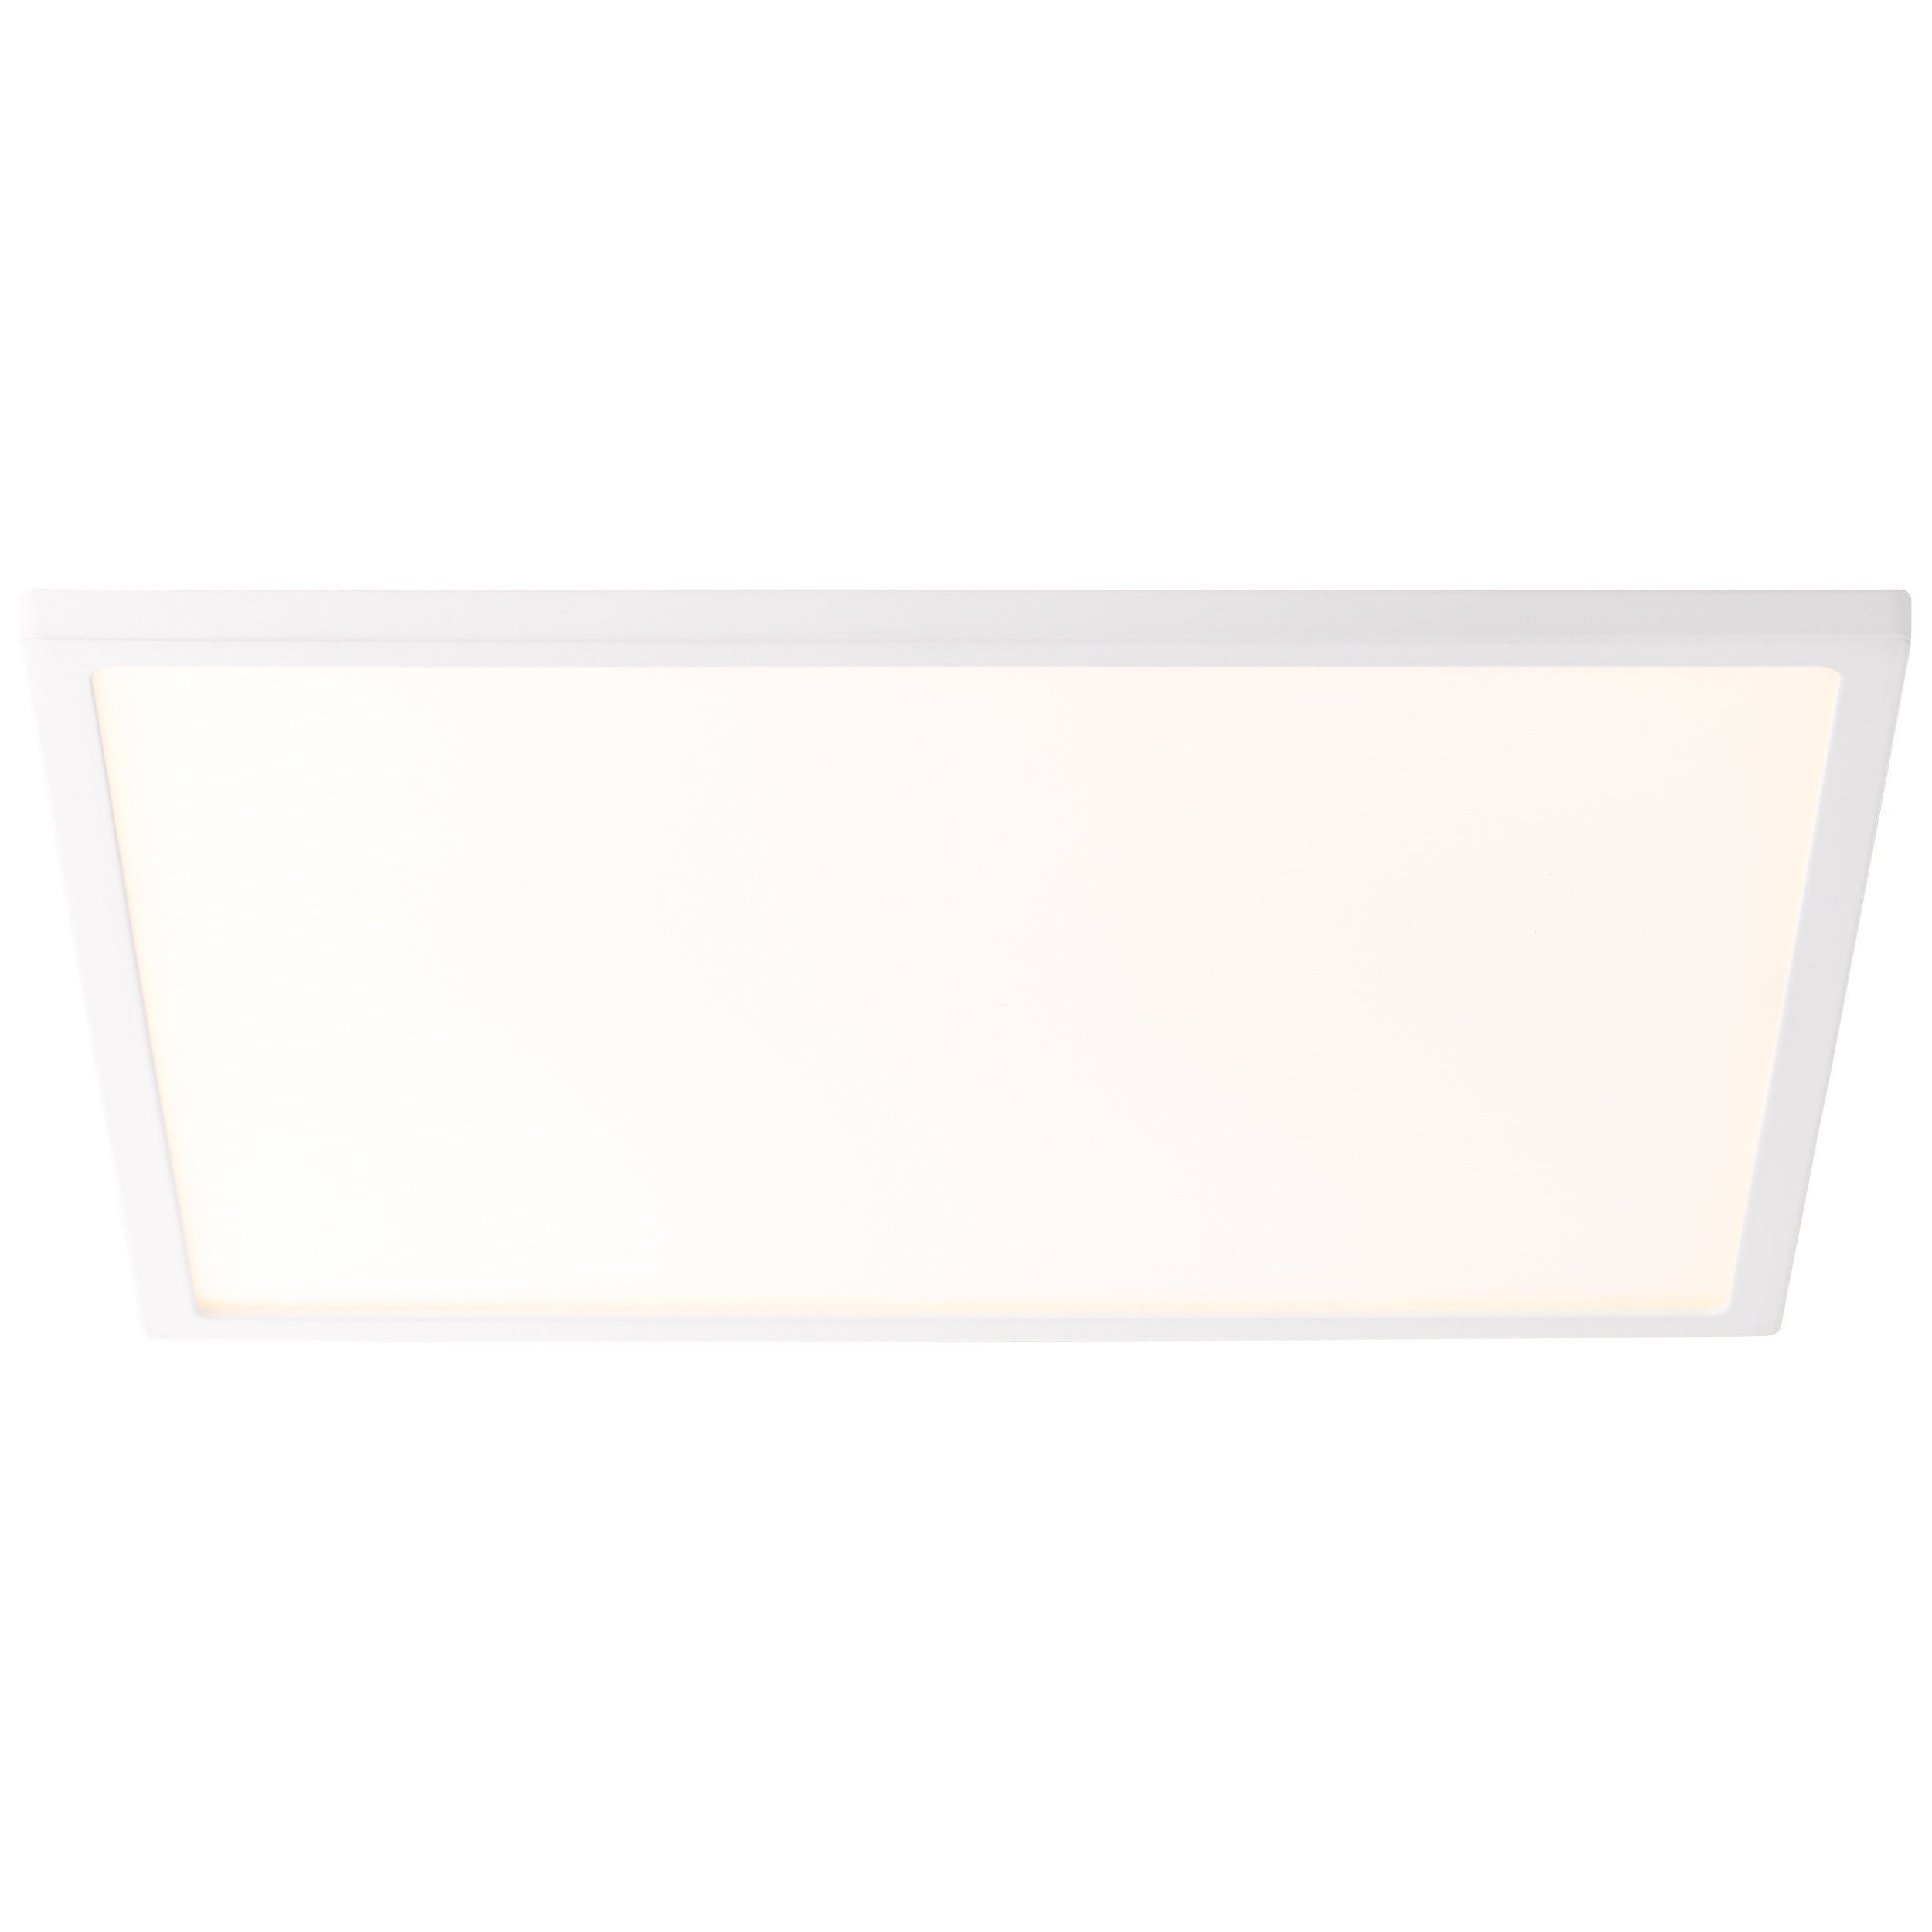 Brilliant Leuchten Ceres LED Deckenaufbau-Paneel 35x35cm eisen easyDim